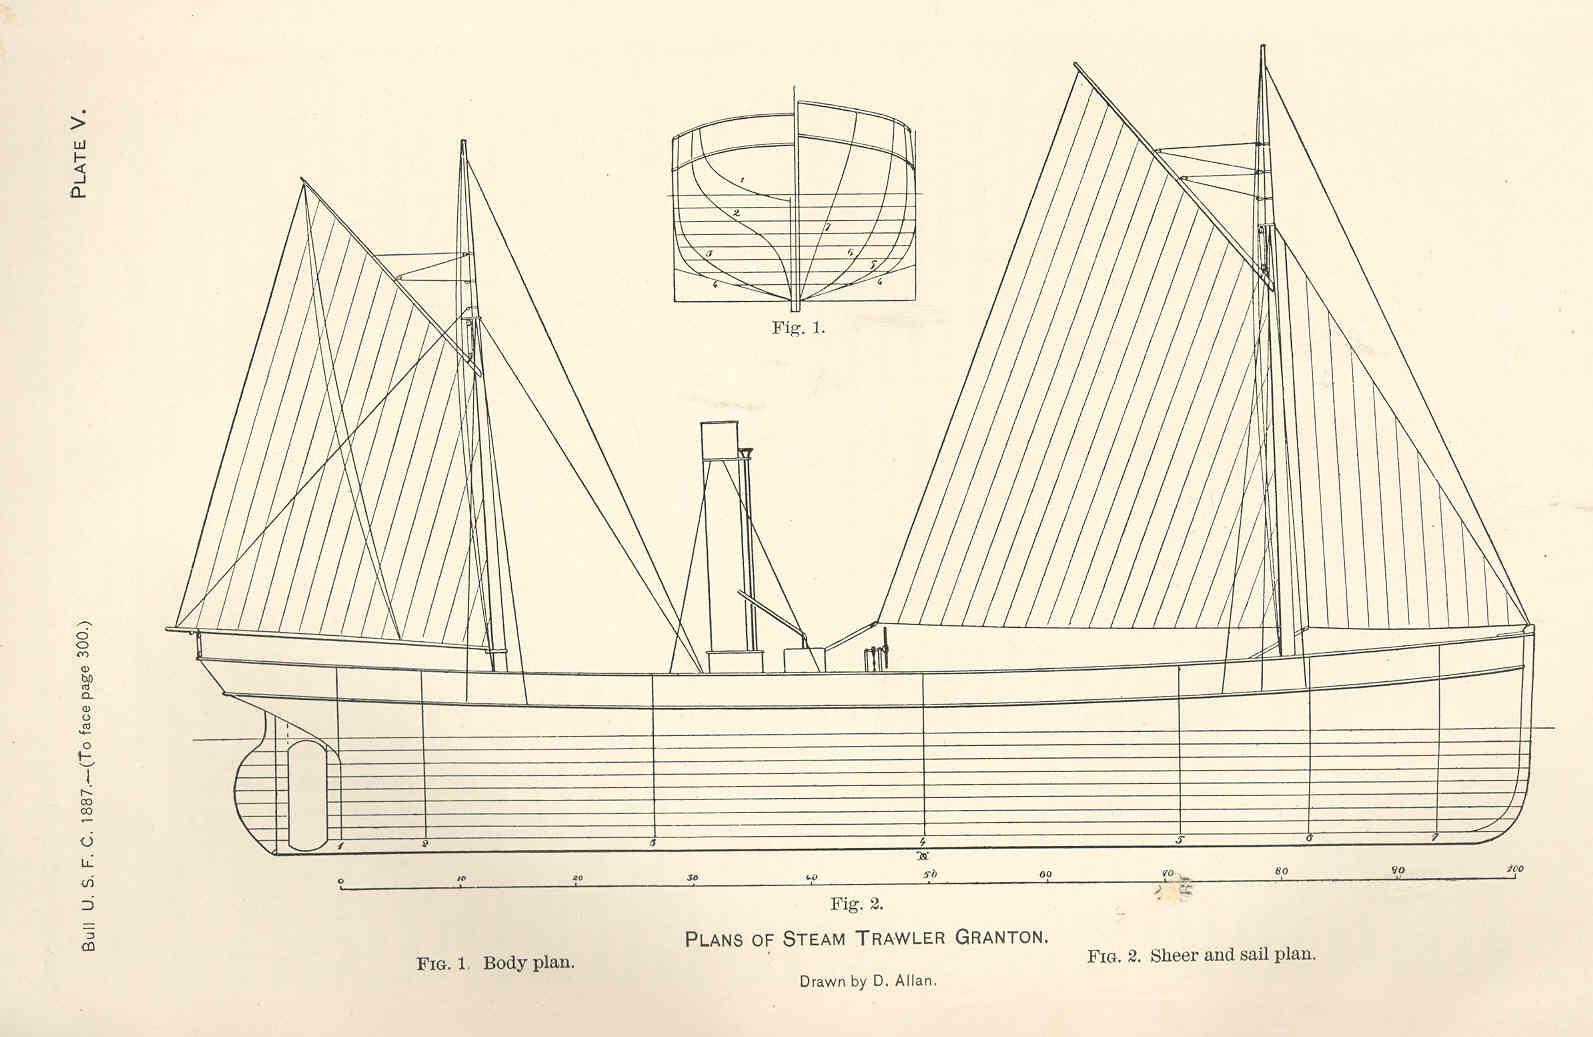 File:FMIB 37812 Plans of Steam Trawler Granton.jpeg - Wikimedia Commons